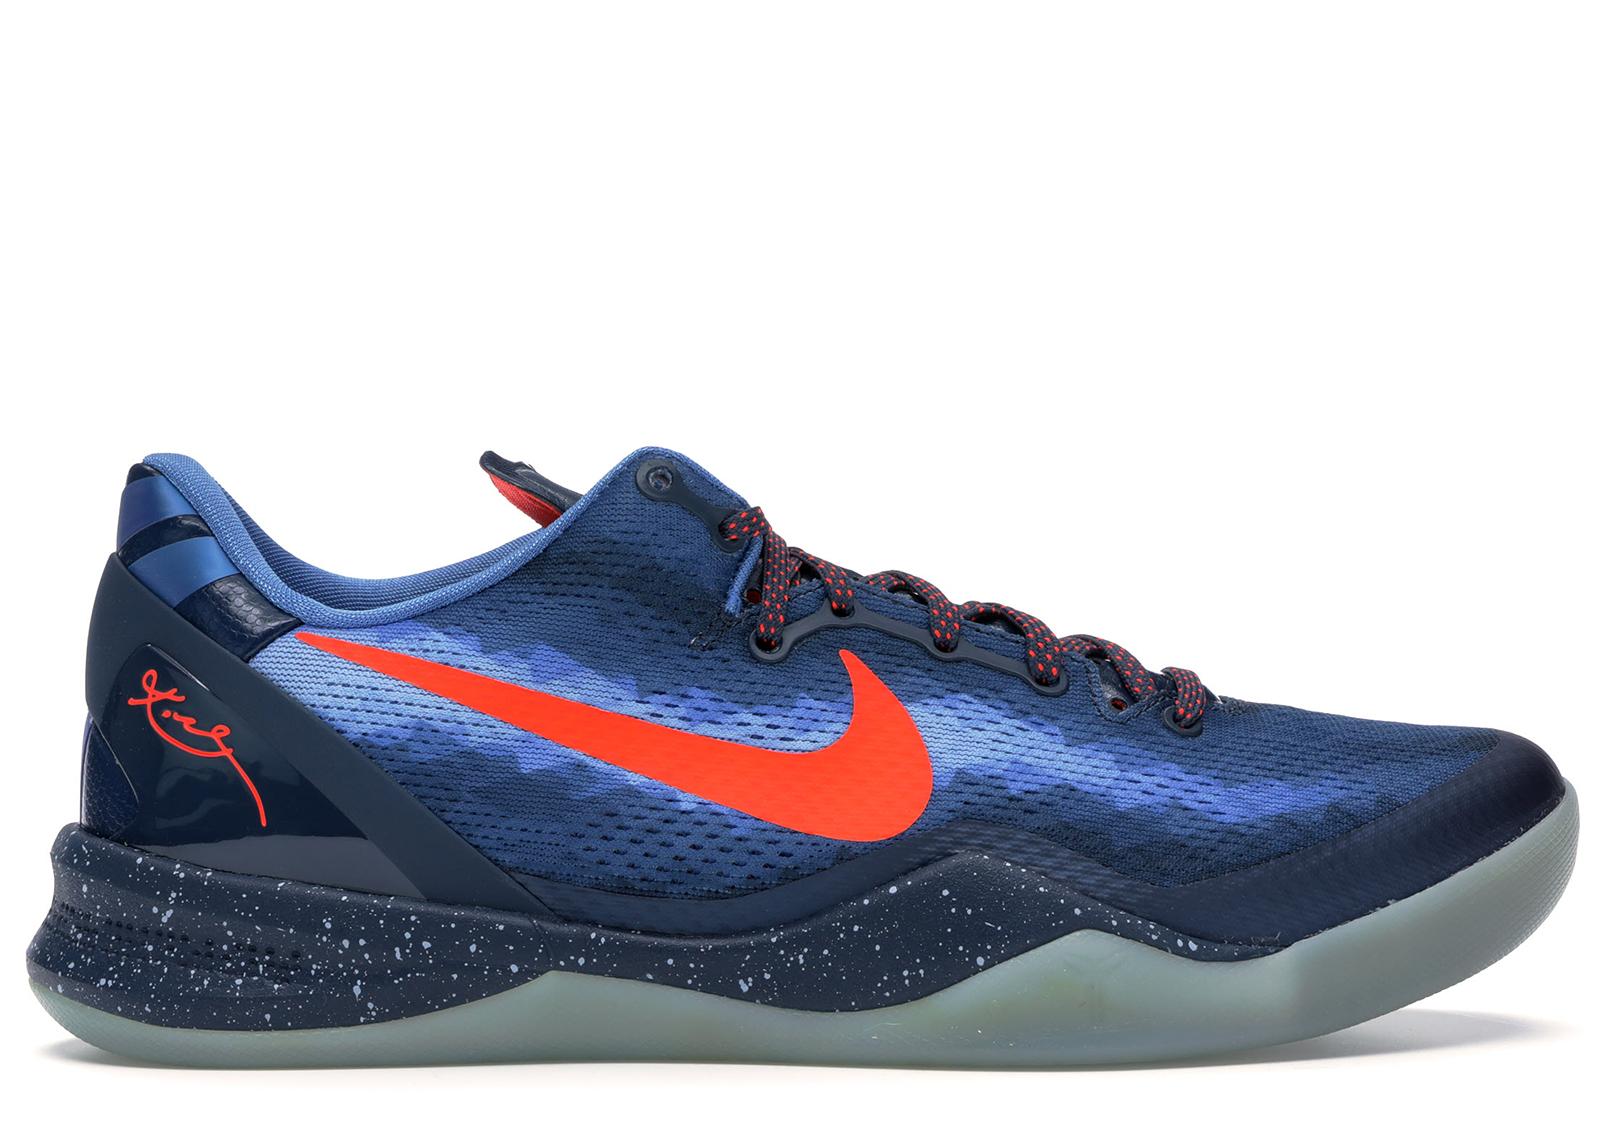 Nike Kobe 8 Blue Blitz - 555035-401